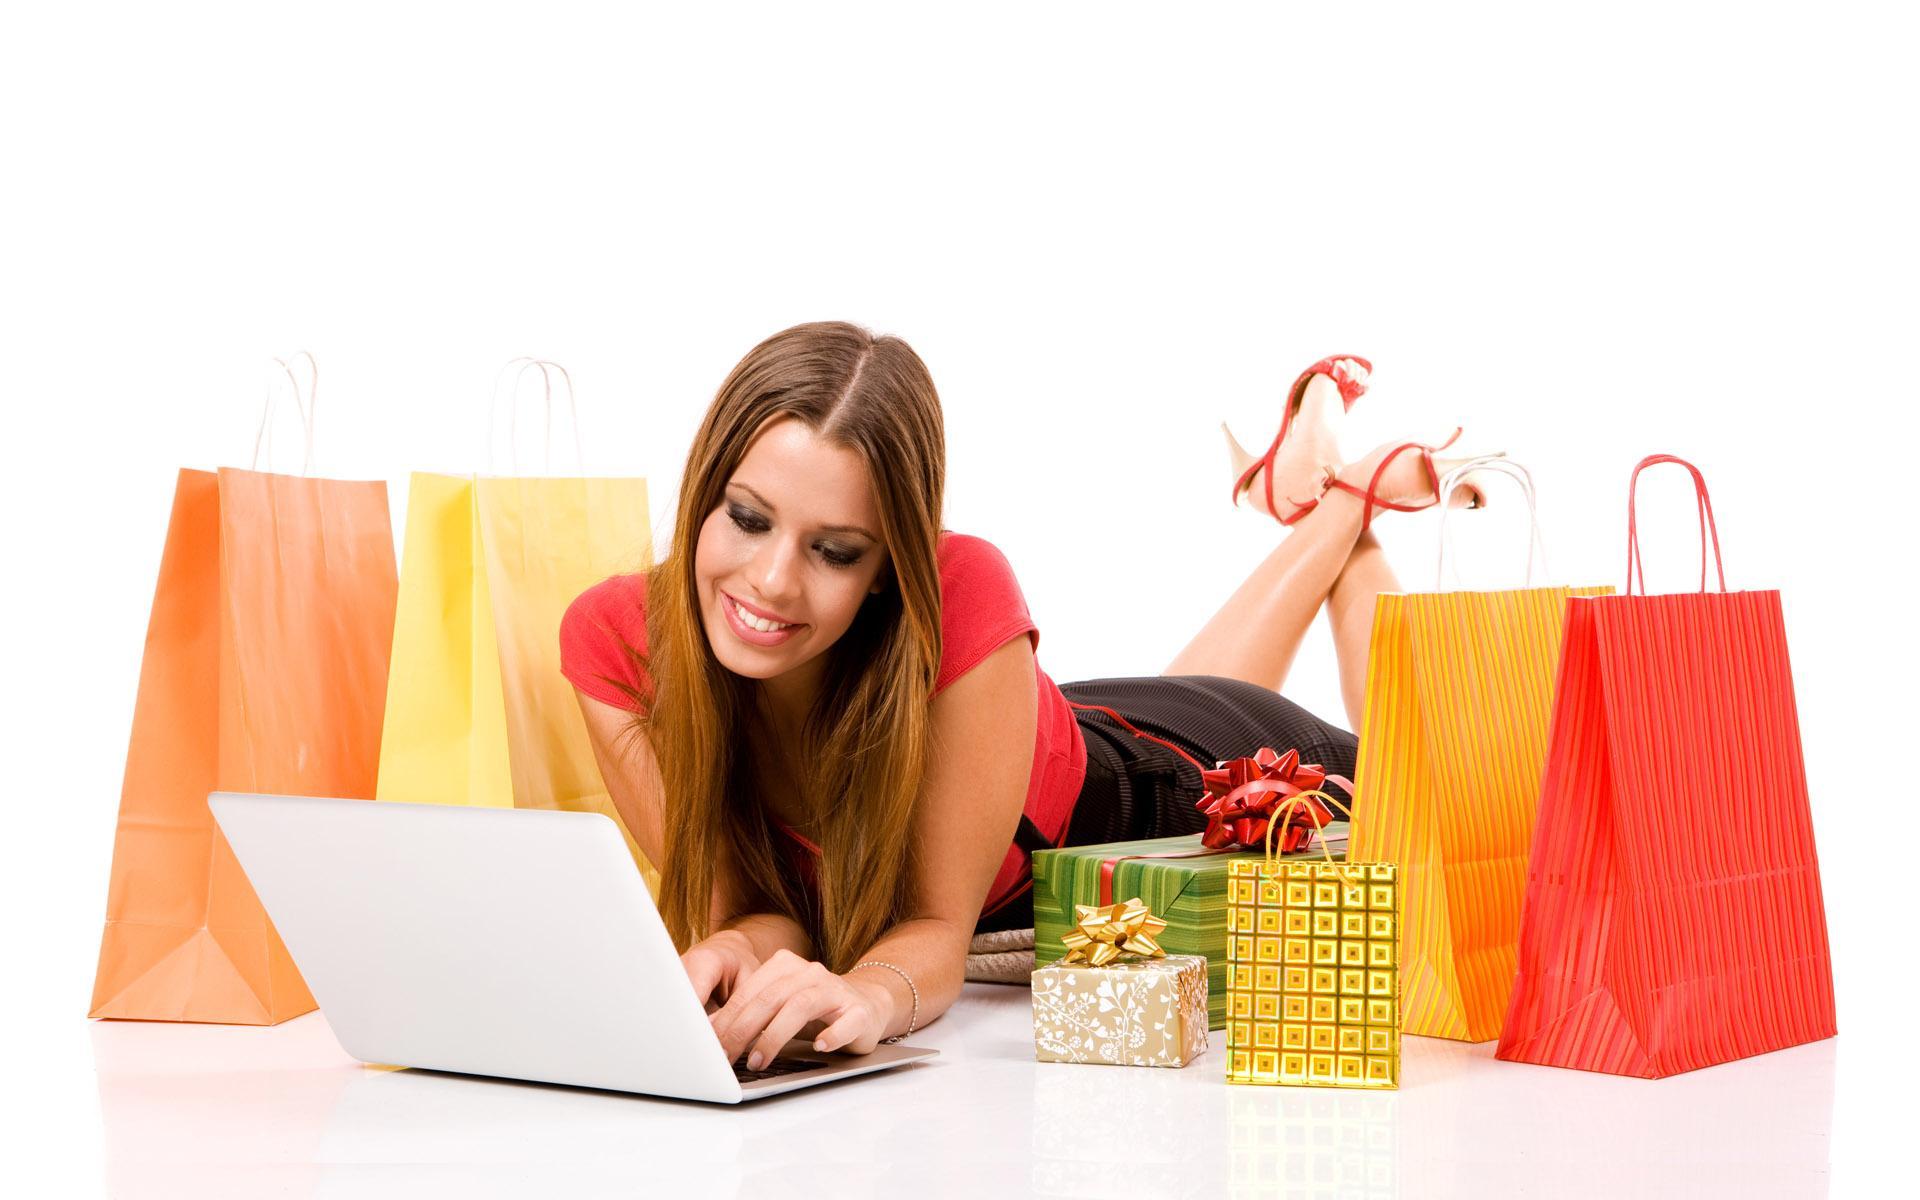 https://www.promotionmagazine.it/wp/wp-content/uploads/2013/09/Shopping-Online.jpg